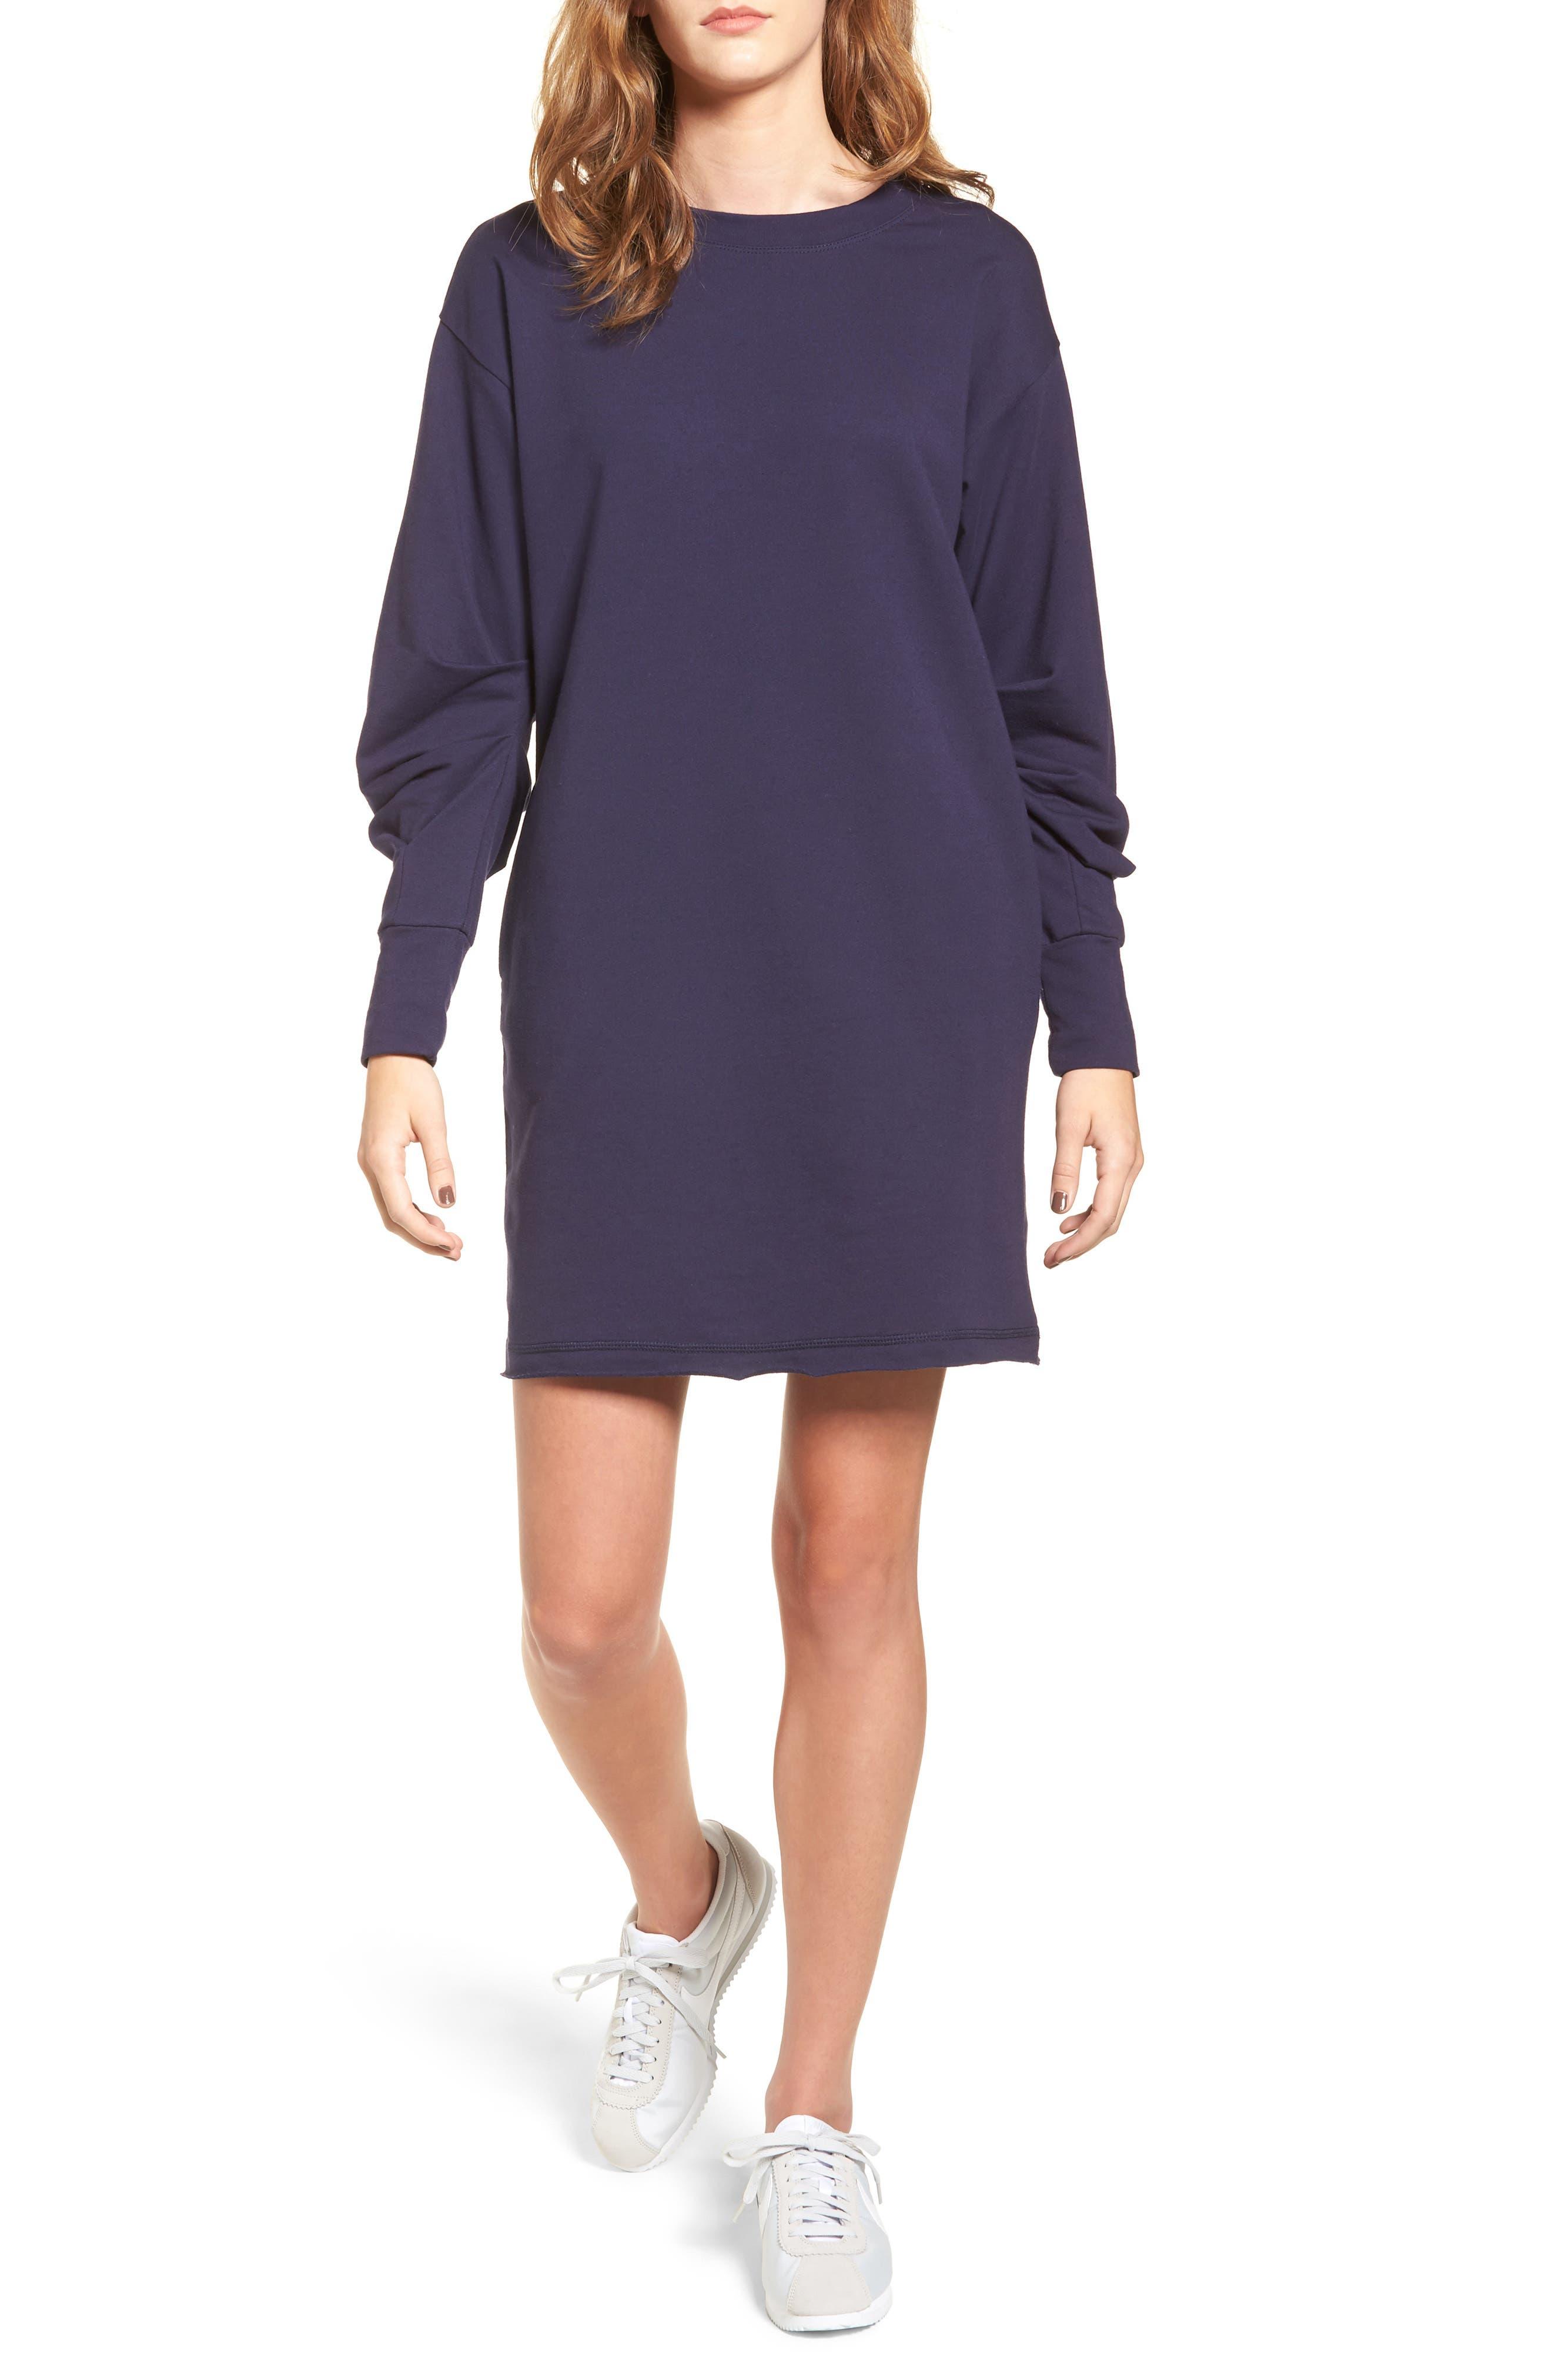 Socialite Gathered Sleeve Sweatshirt Dress